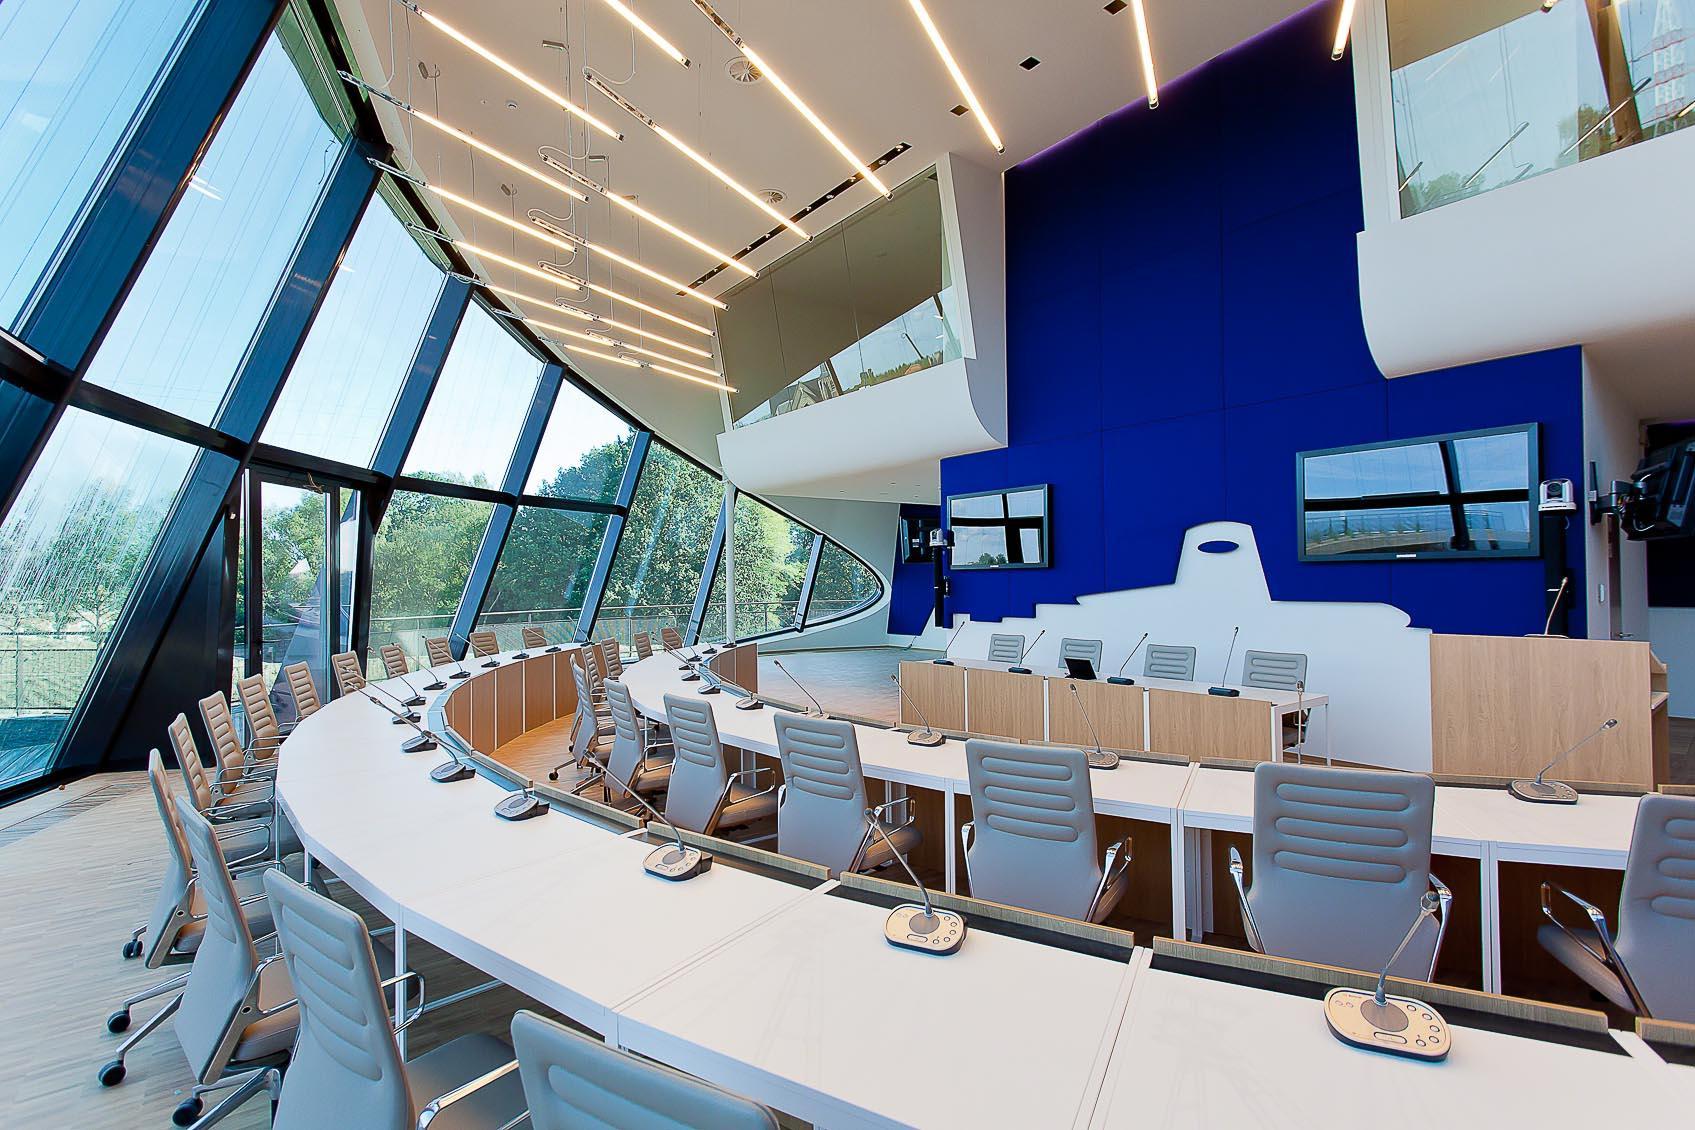 conferentiezaal nac houthalen , dynamisch lichtconcept door lichthuis mol belgië